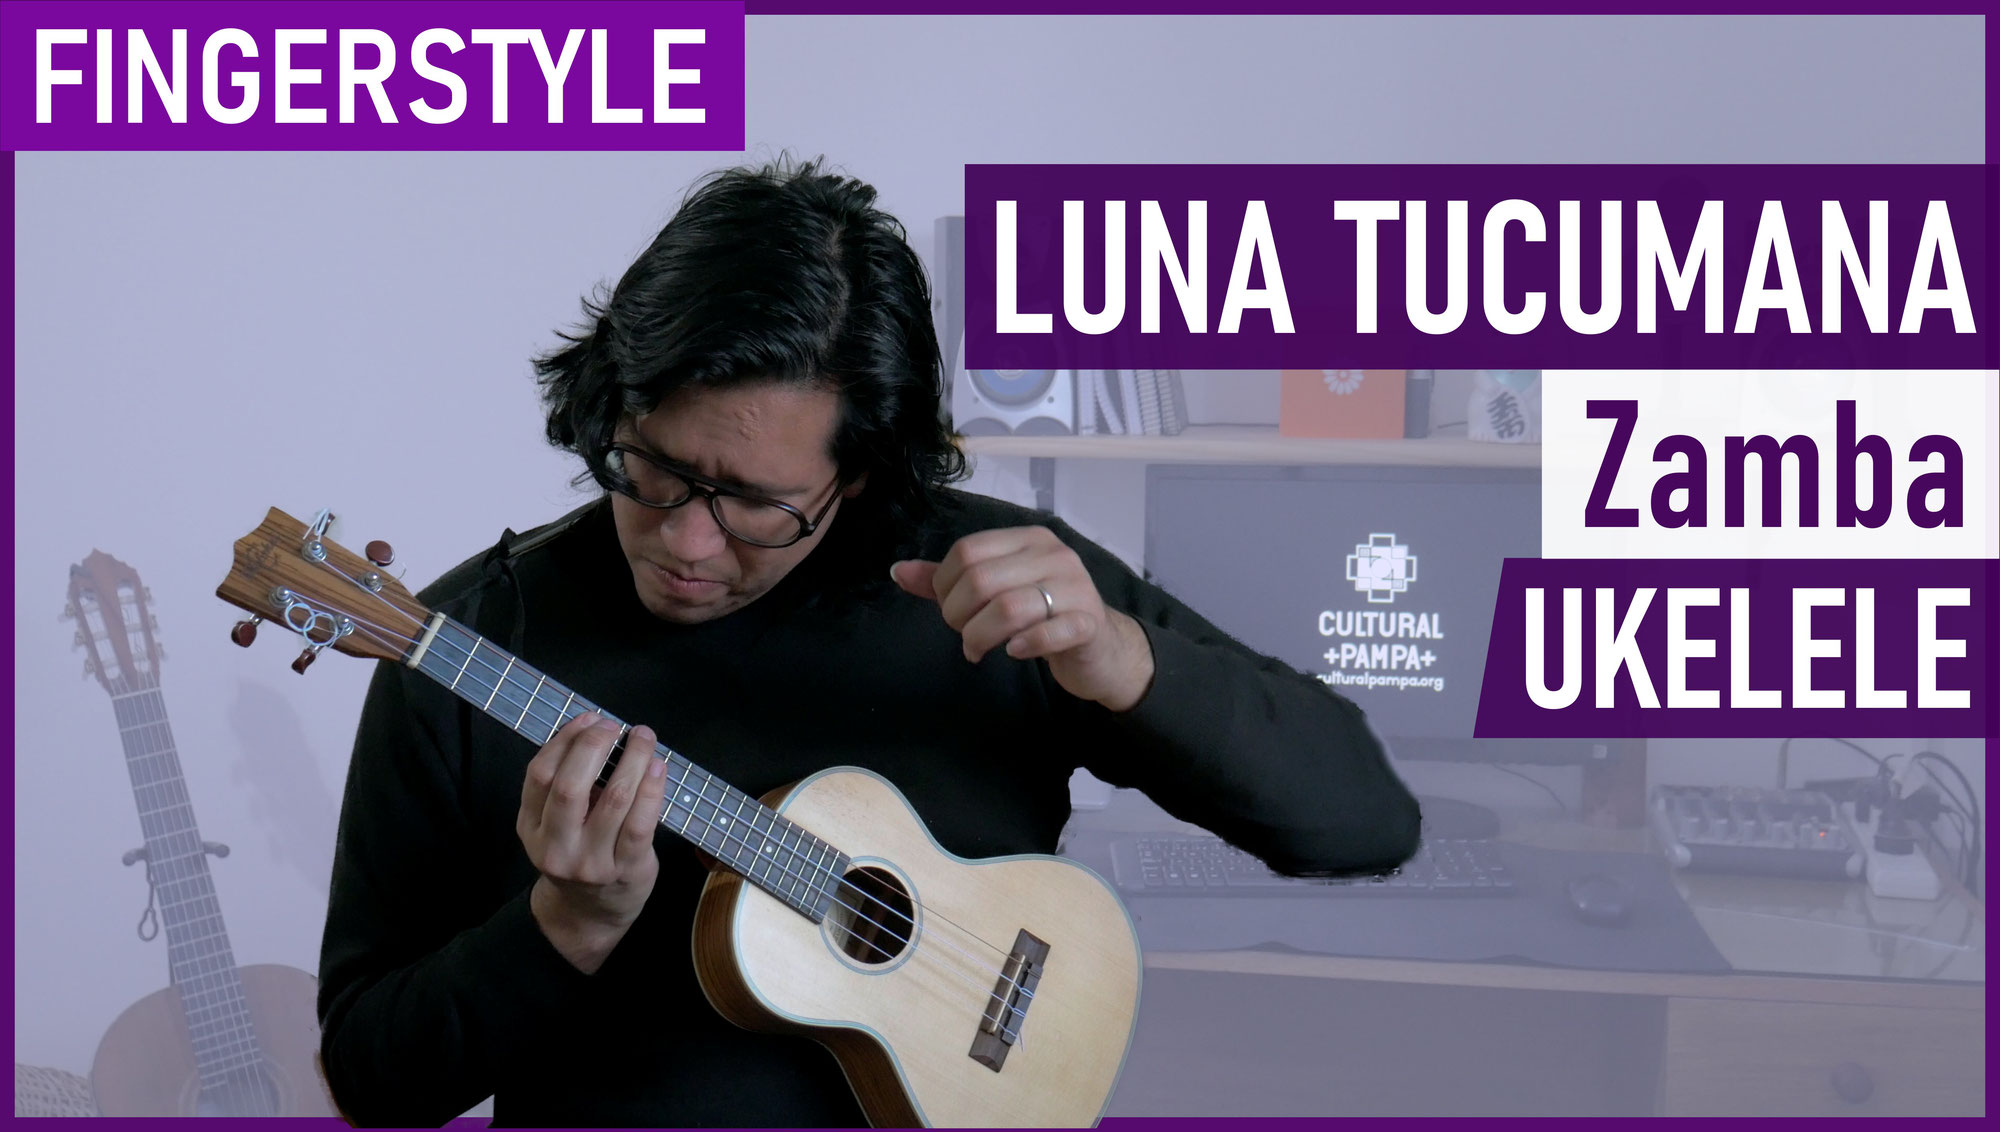 Luna Tucumana (Atahualpa Yupanqui)   Ukelele FINGERSTYLE Cover